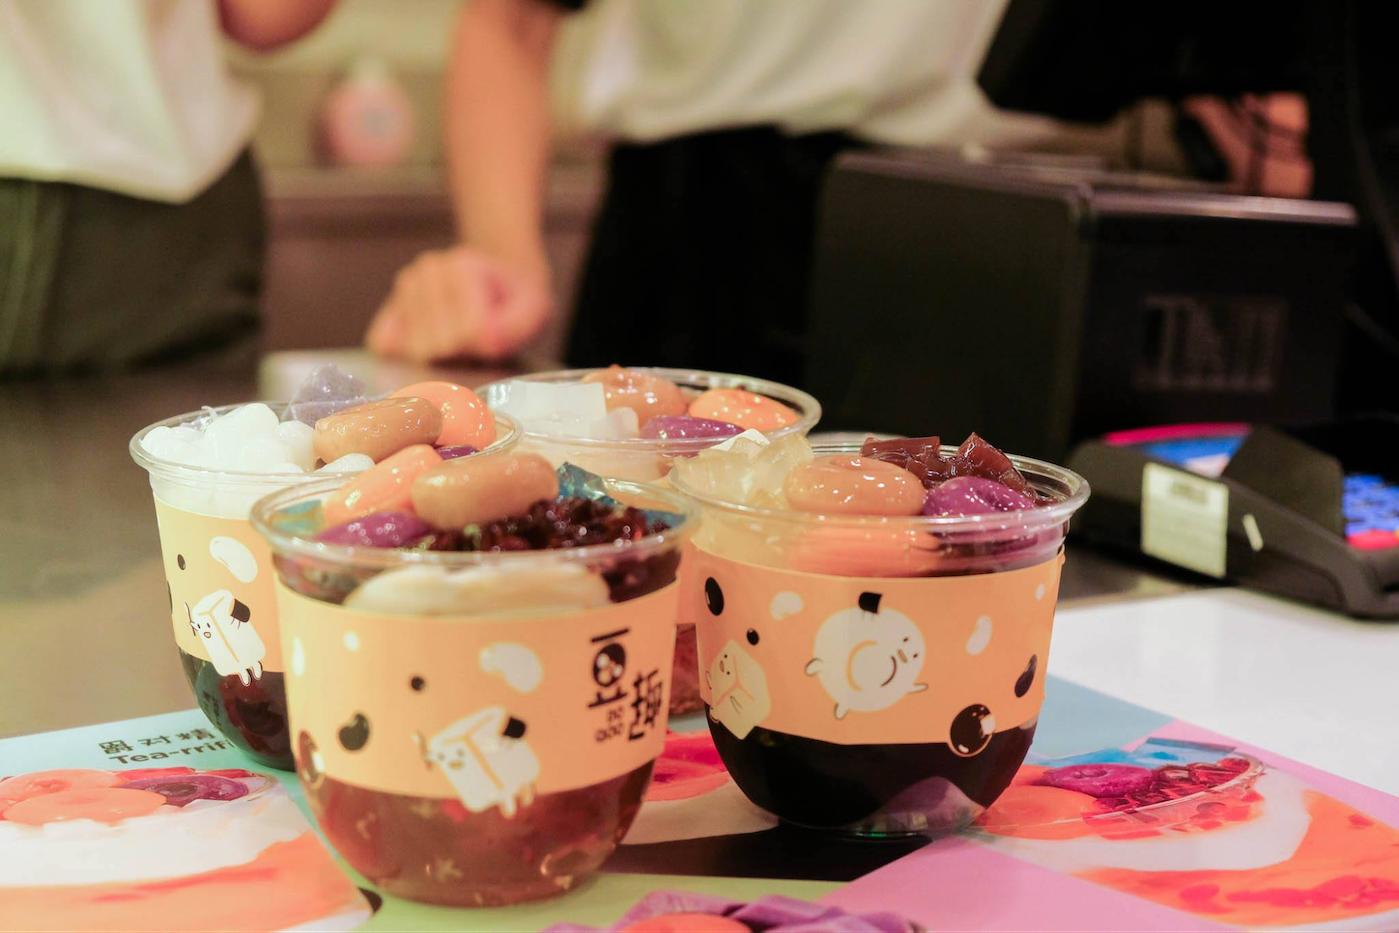 mr bean do qoo abacus seed dessert singapore